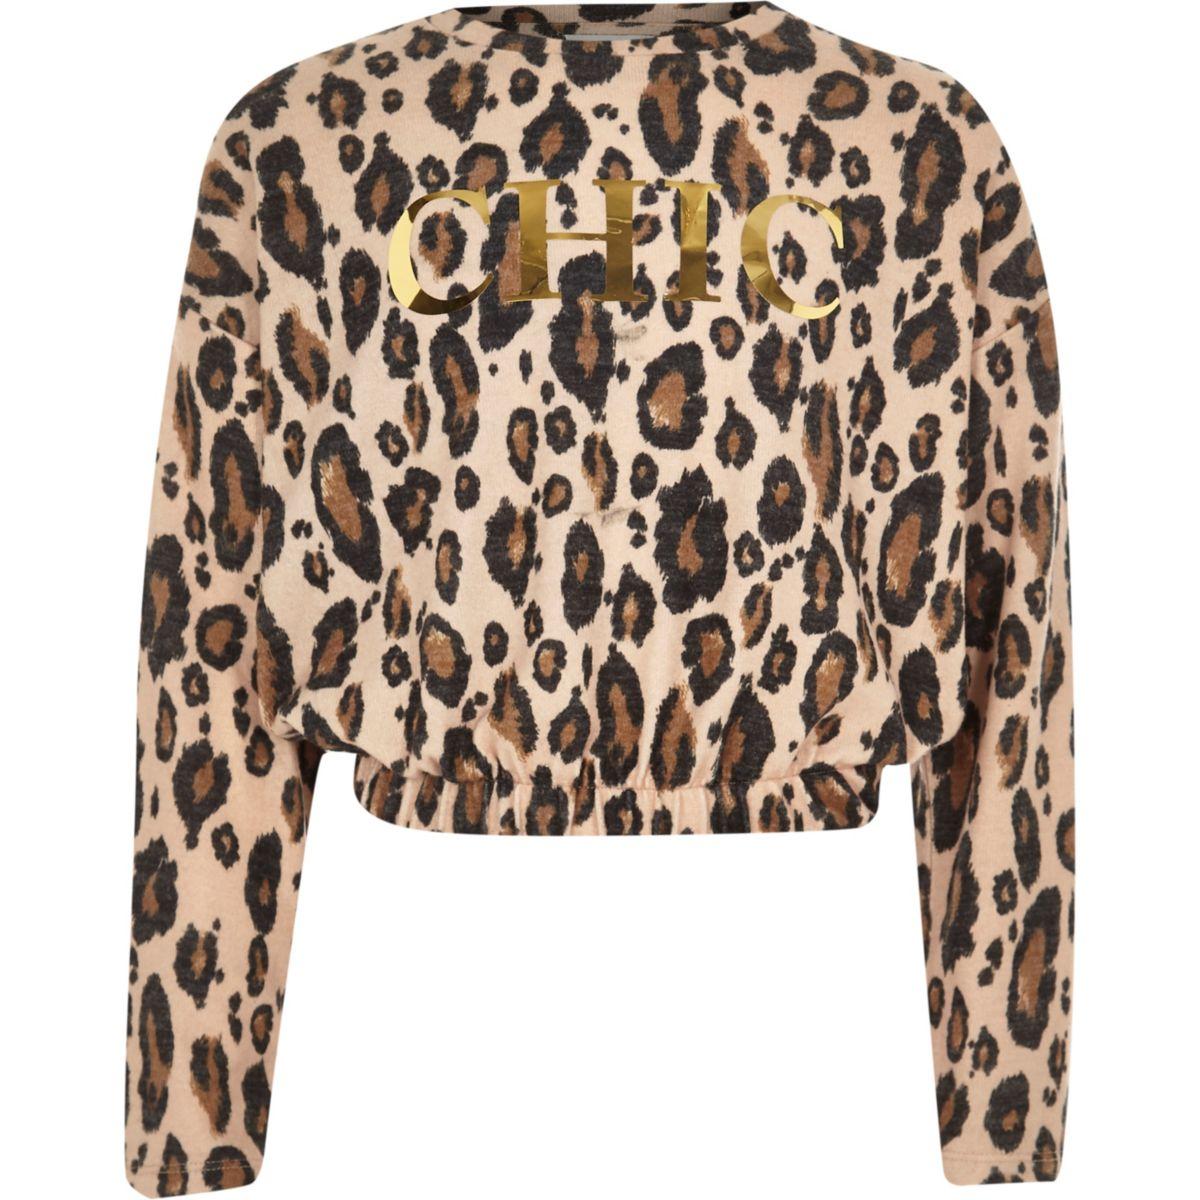 Girls cream leopard print 'chic' jumper